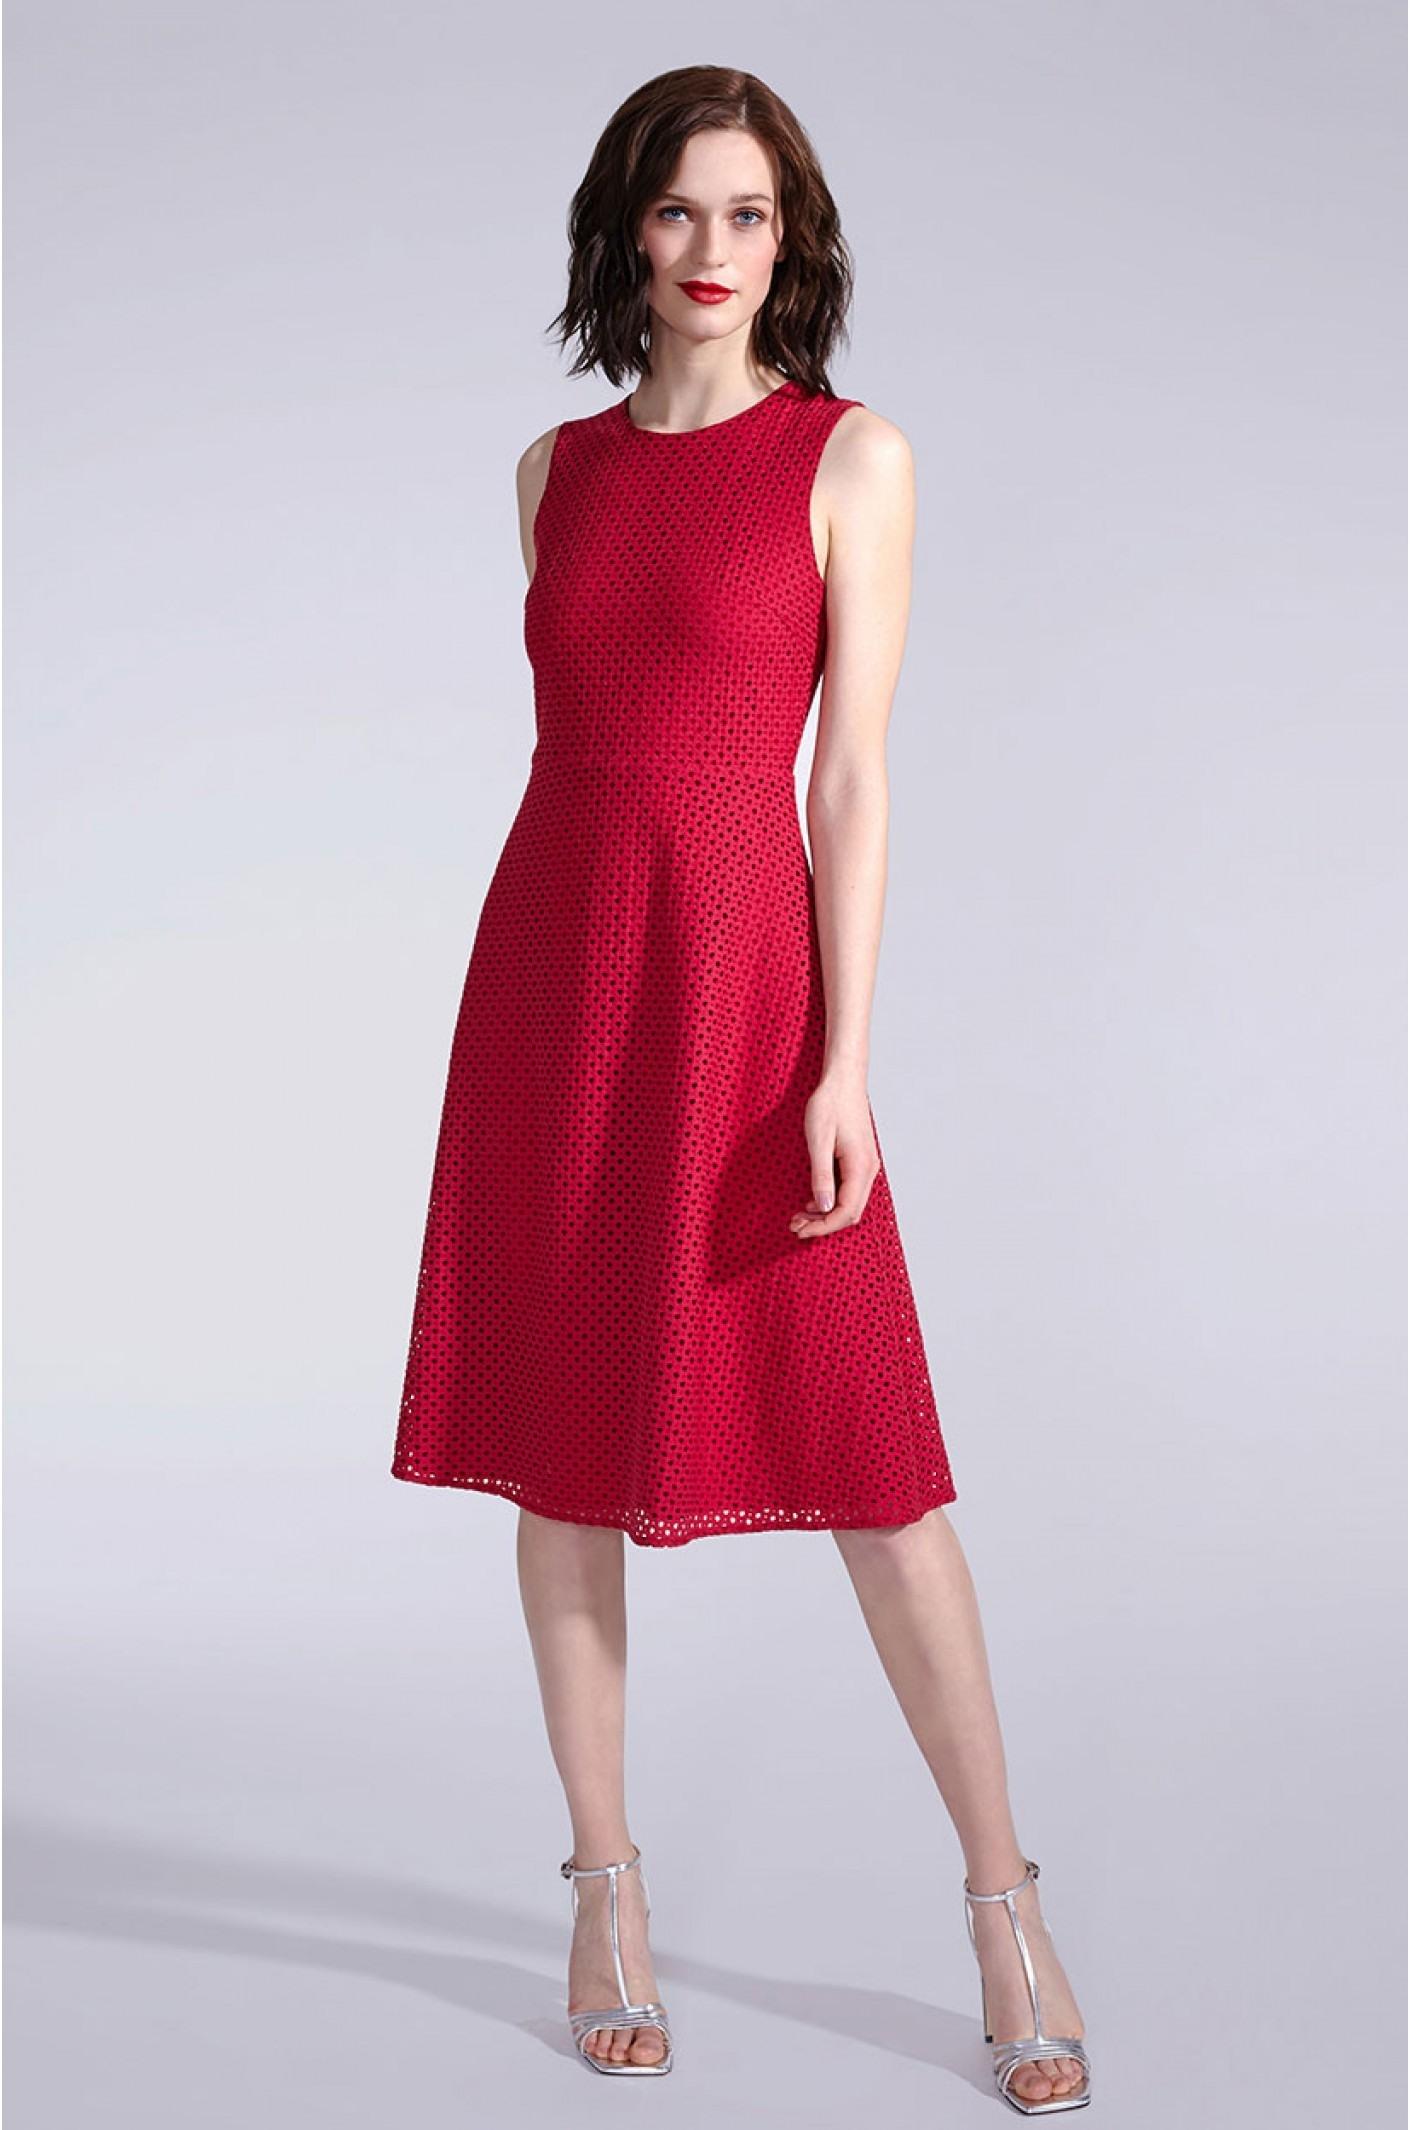 17 Kreativ Kleid Rot Spitze ÄrmelFormal Coolste Kleid Rot Spitze Vertrieb